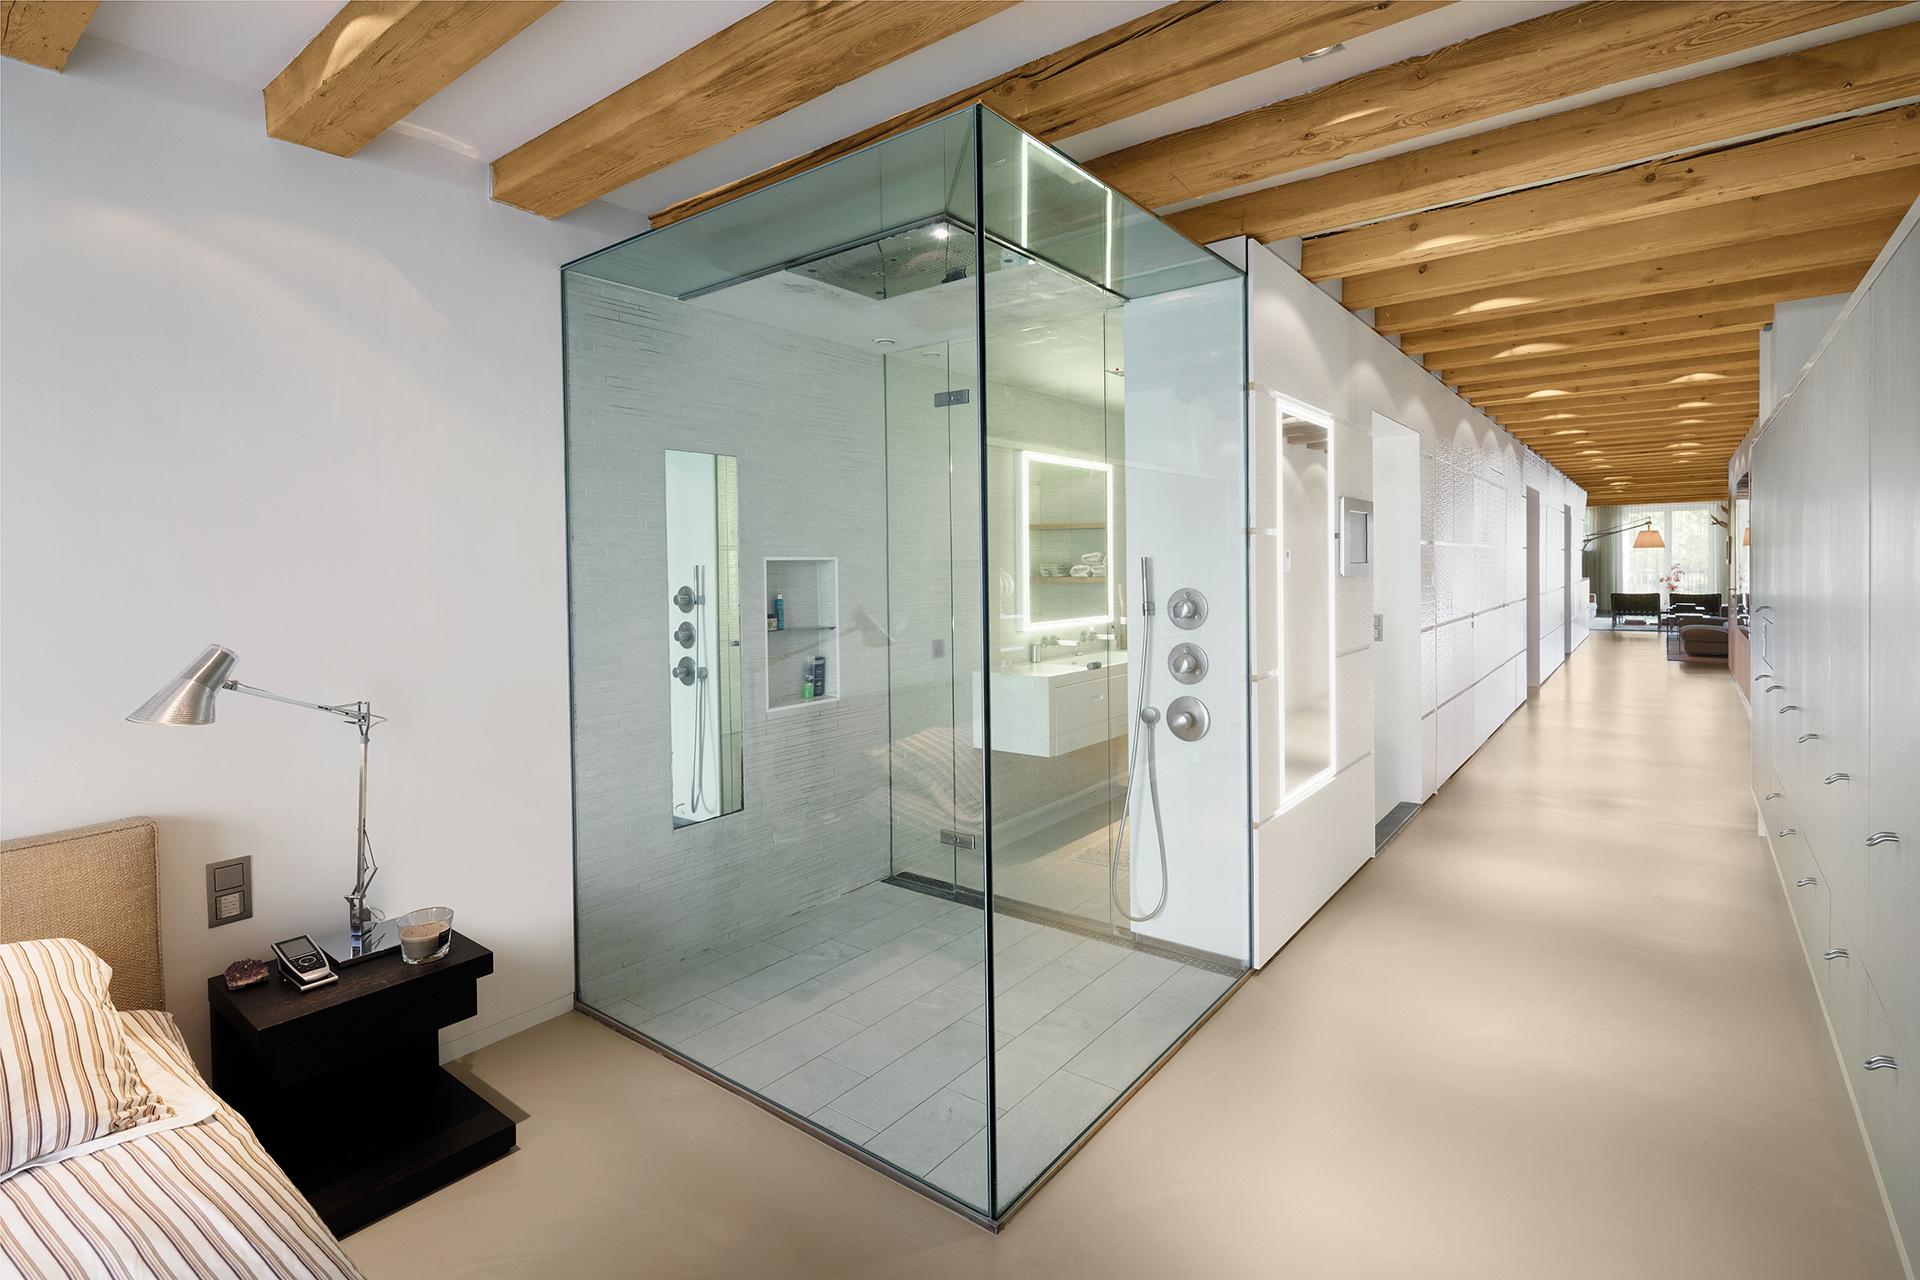 Exterior of the bathroom with privacy smartglass